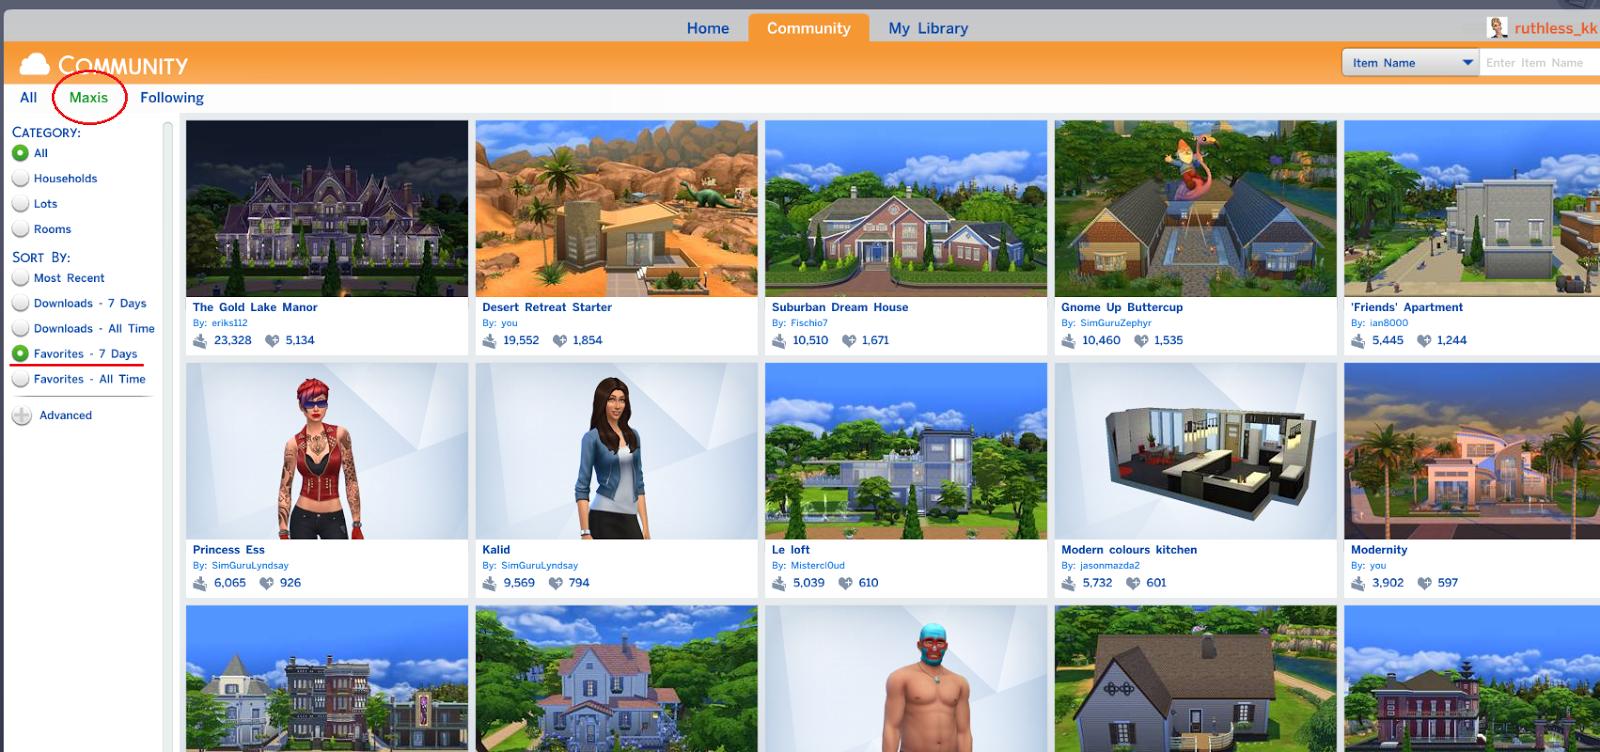 The Sims 4 Tutorial: Using the Gallery | SimsVIP